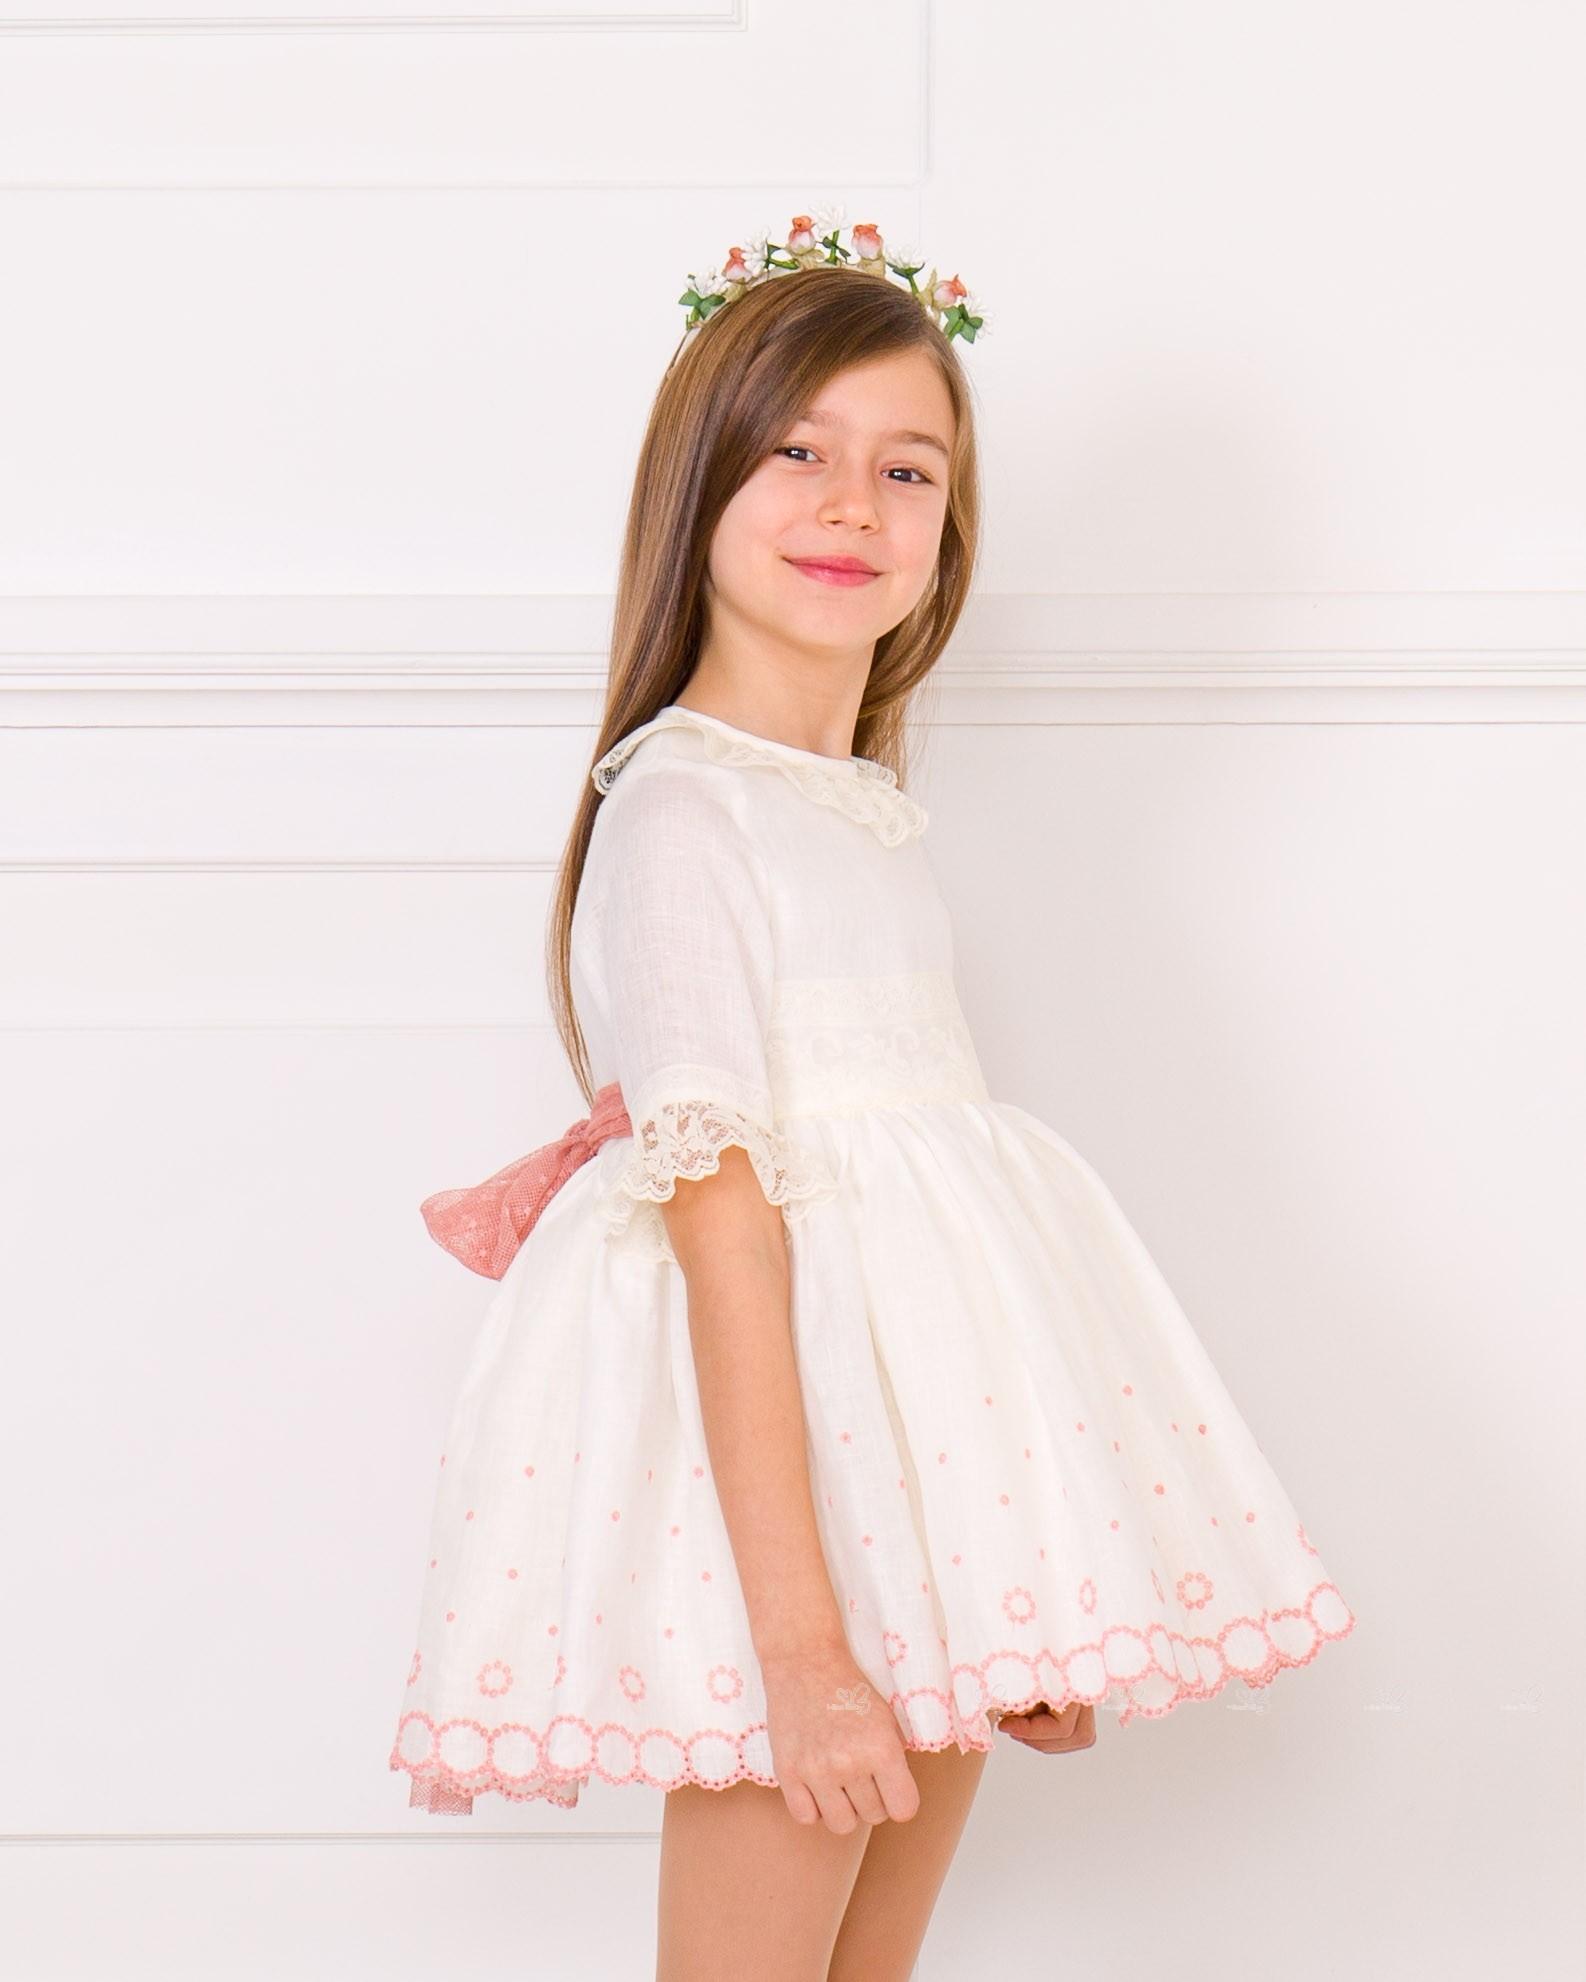 1a1794a4ee Lappepa Moda Infantil Vestido Niña Manga Francesa Bordado   Encaje ...